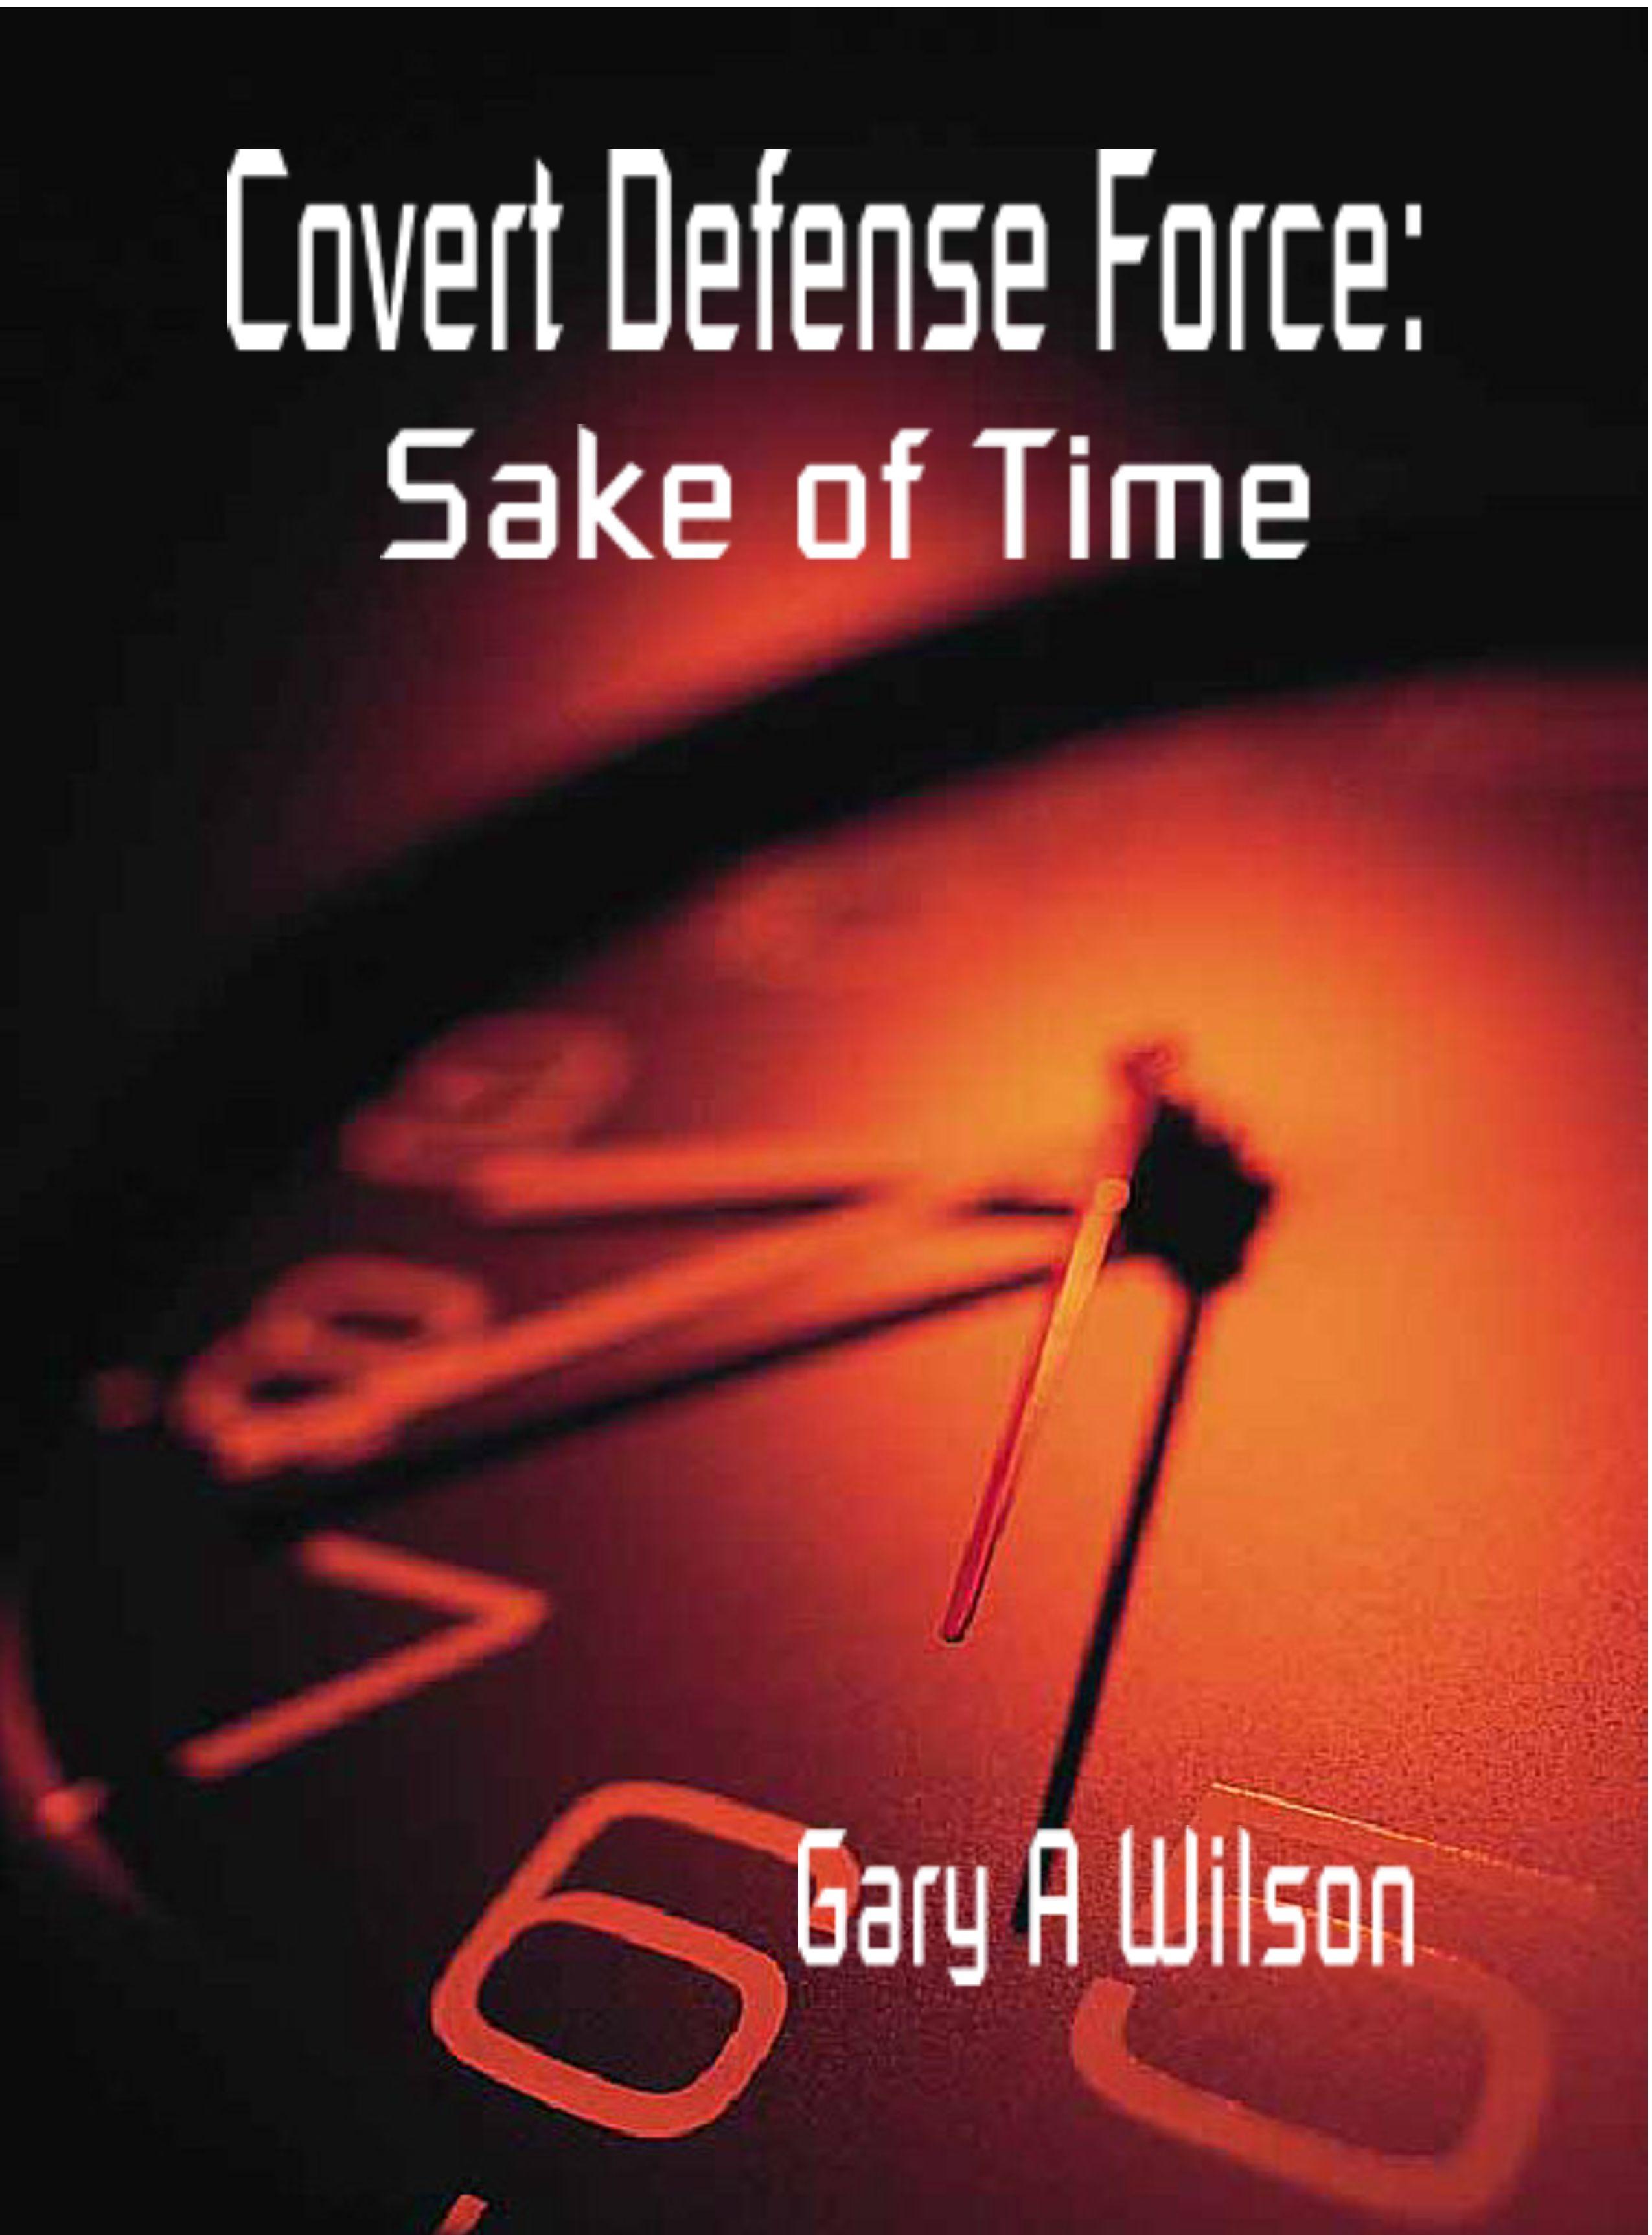 Covert Defense Force: Sake of Time